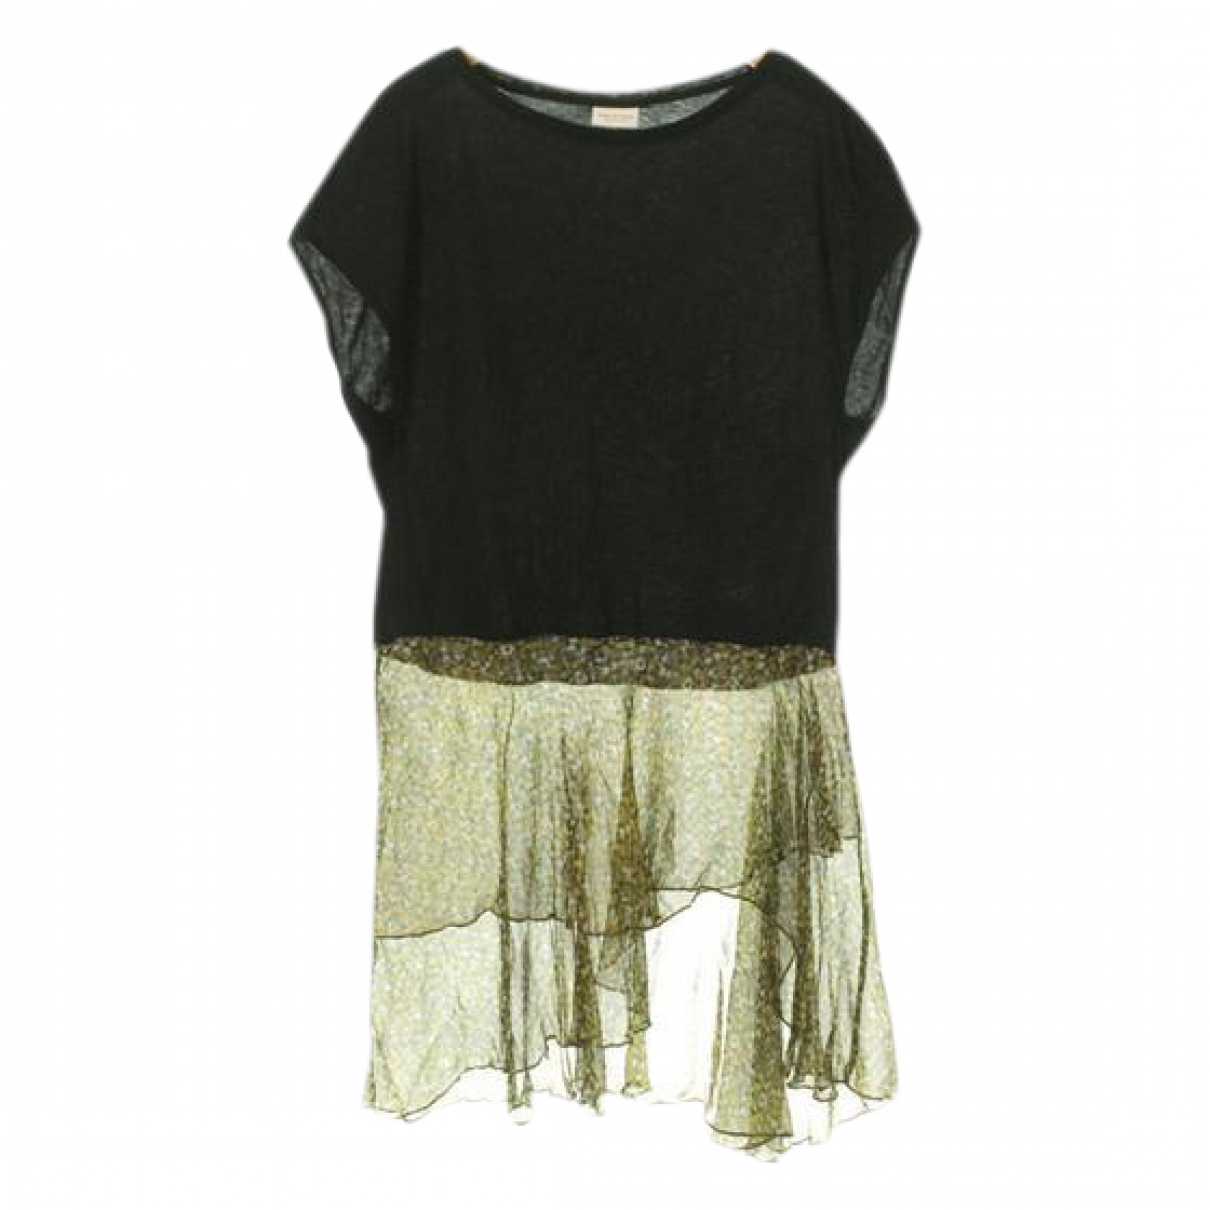 Dries Van Noten \N Black Cotton dress for Women XS International